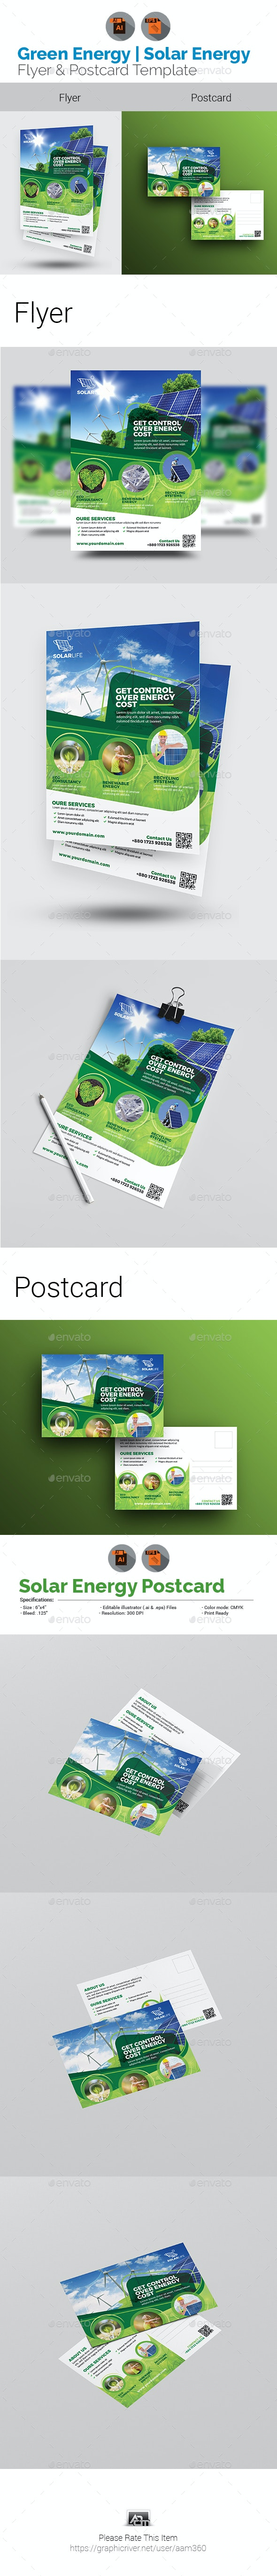 Solar Energy Flyer & Postcard Bundle - Corporate Flyers